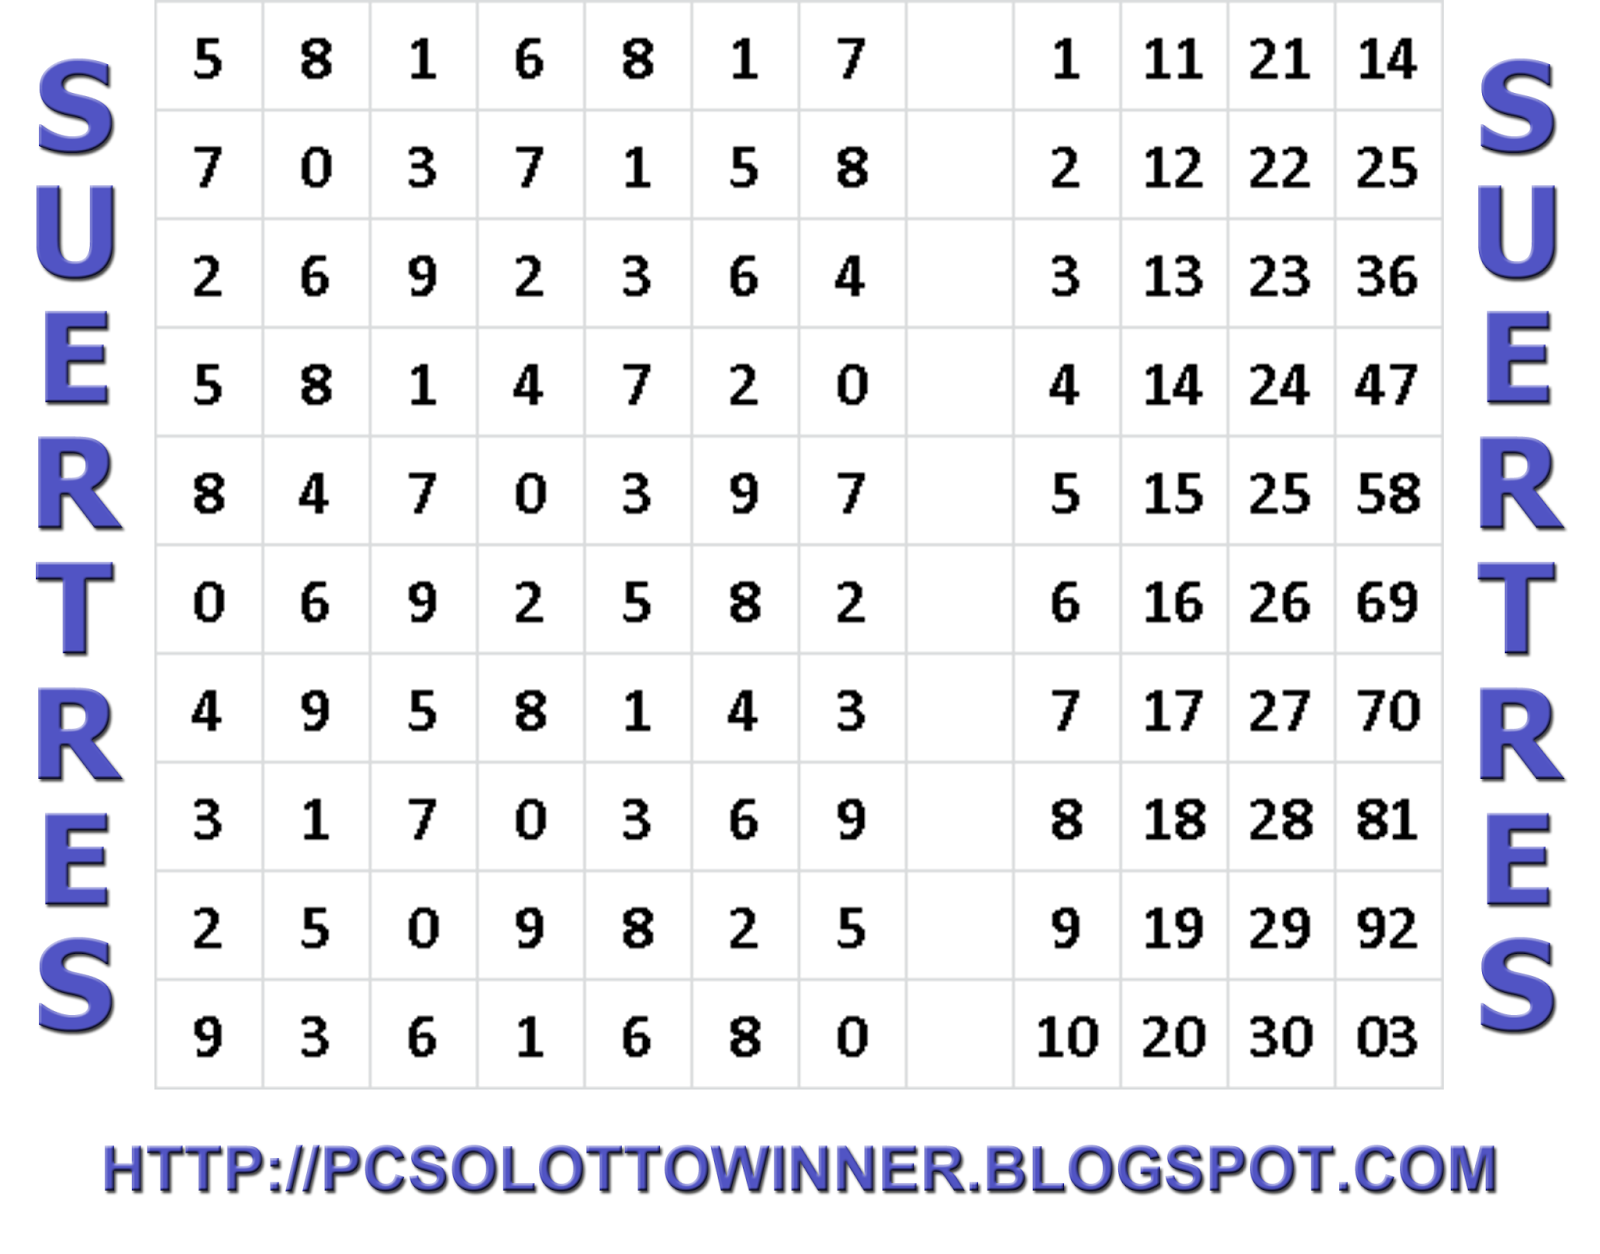 tabular magic table pcso lotto results tabular magic table